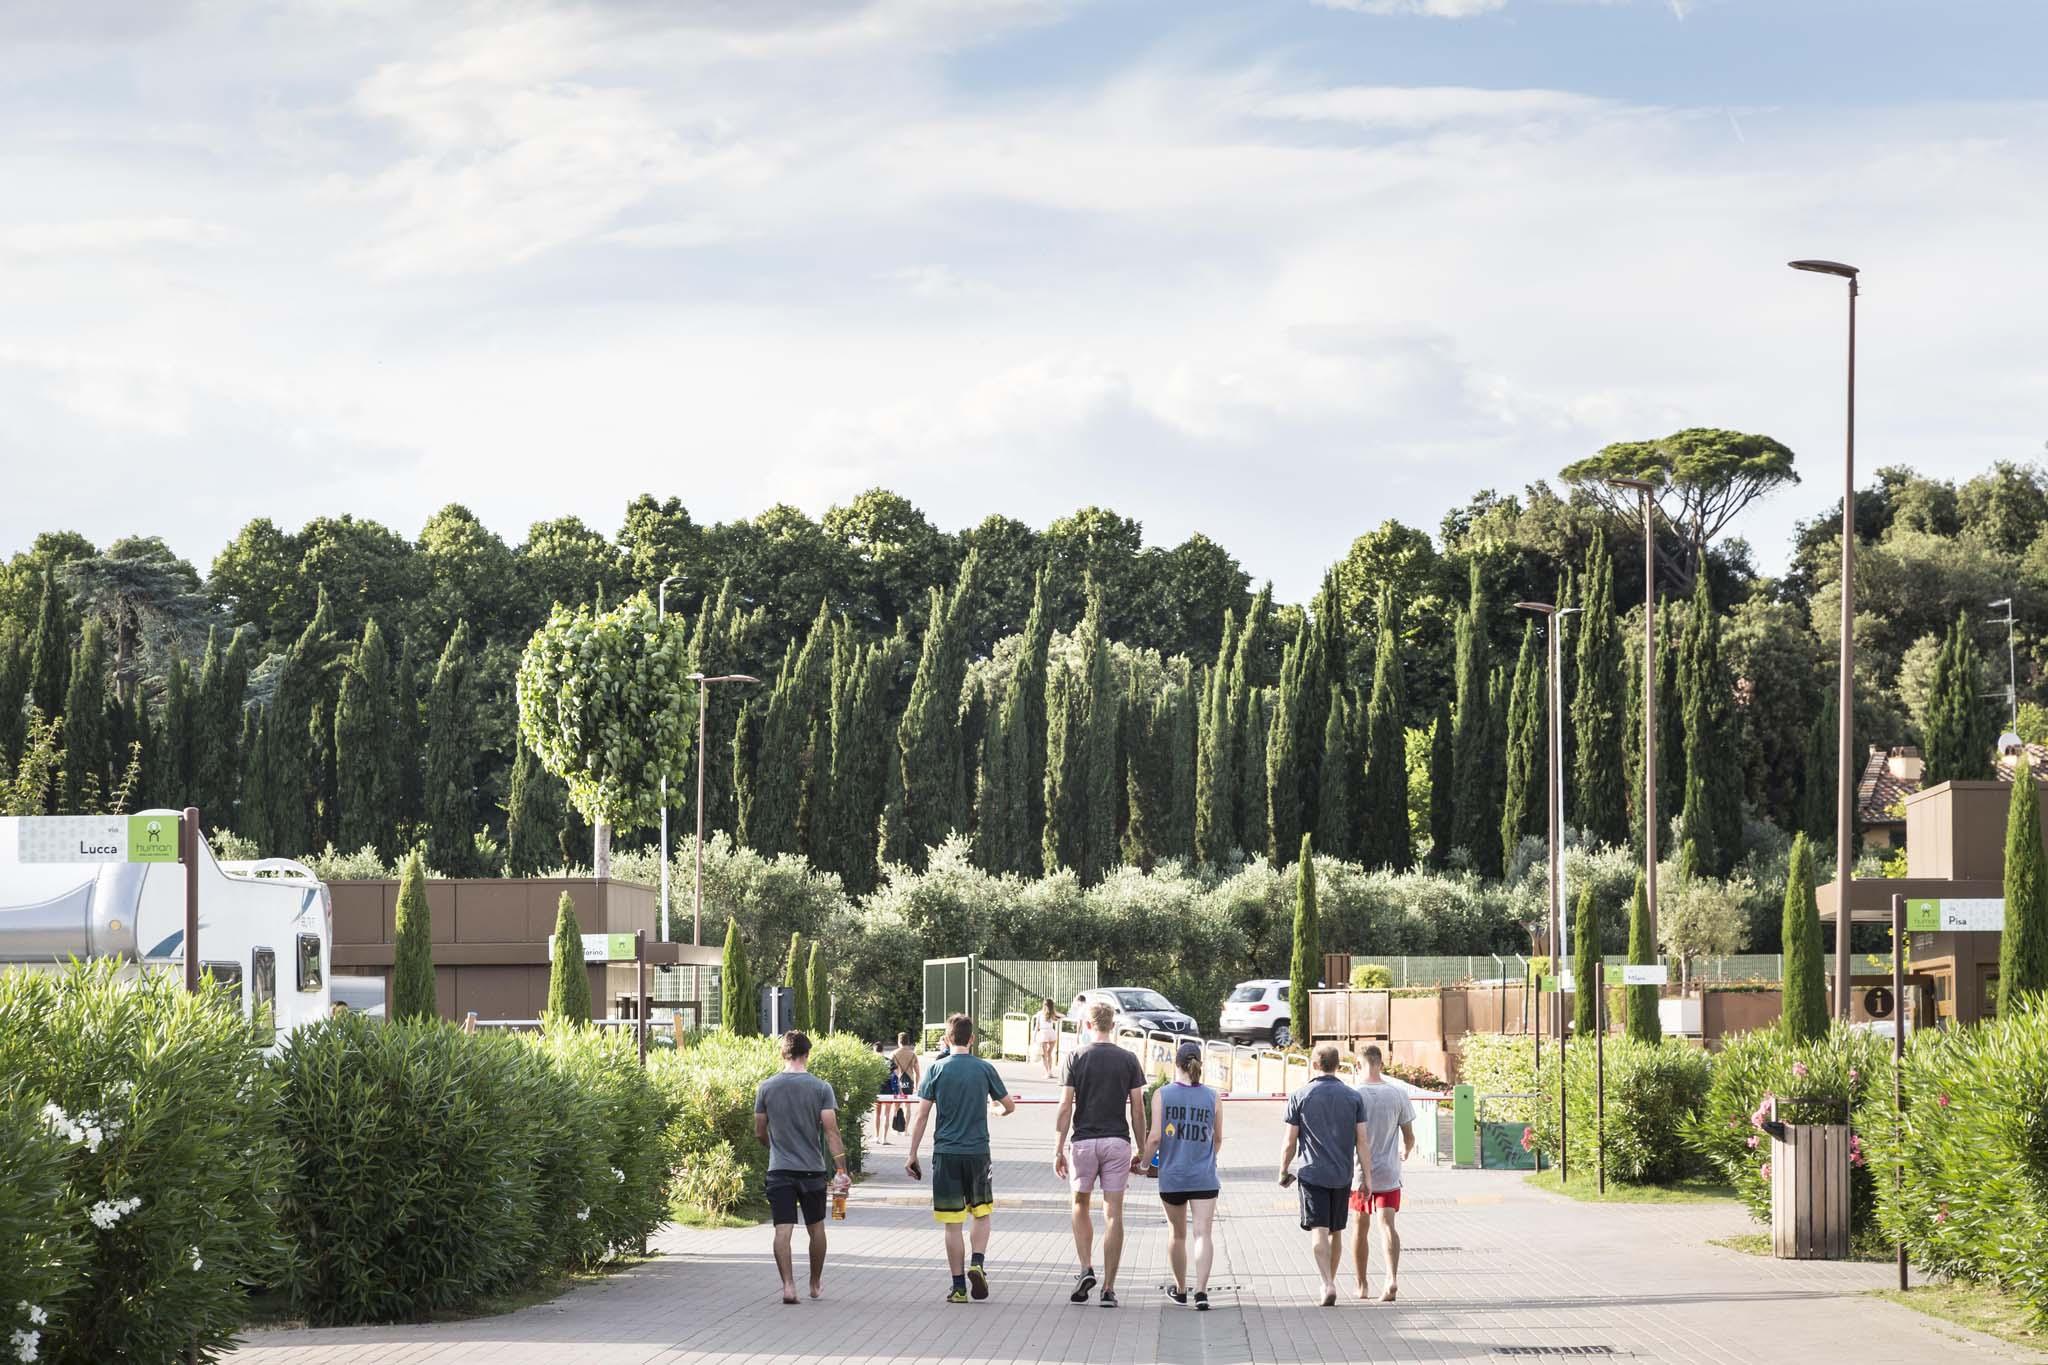 Case mobili e piazzole immerse nel verde a Firenze